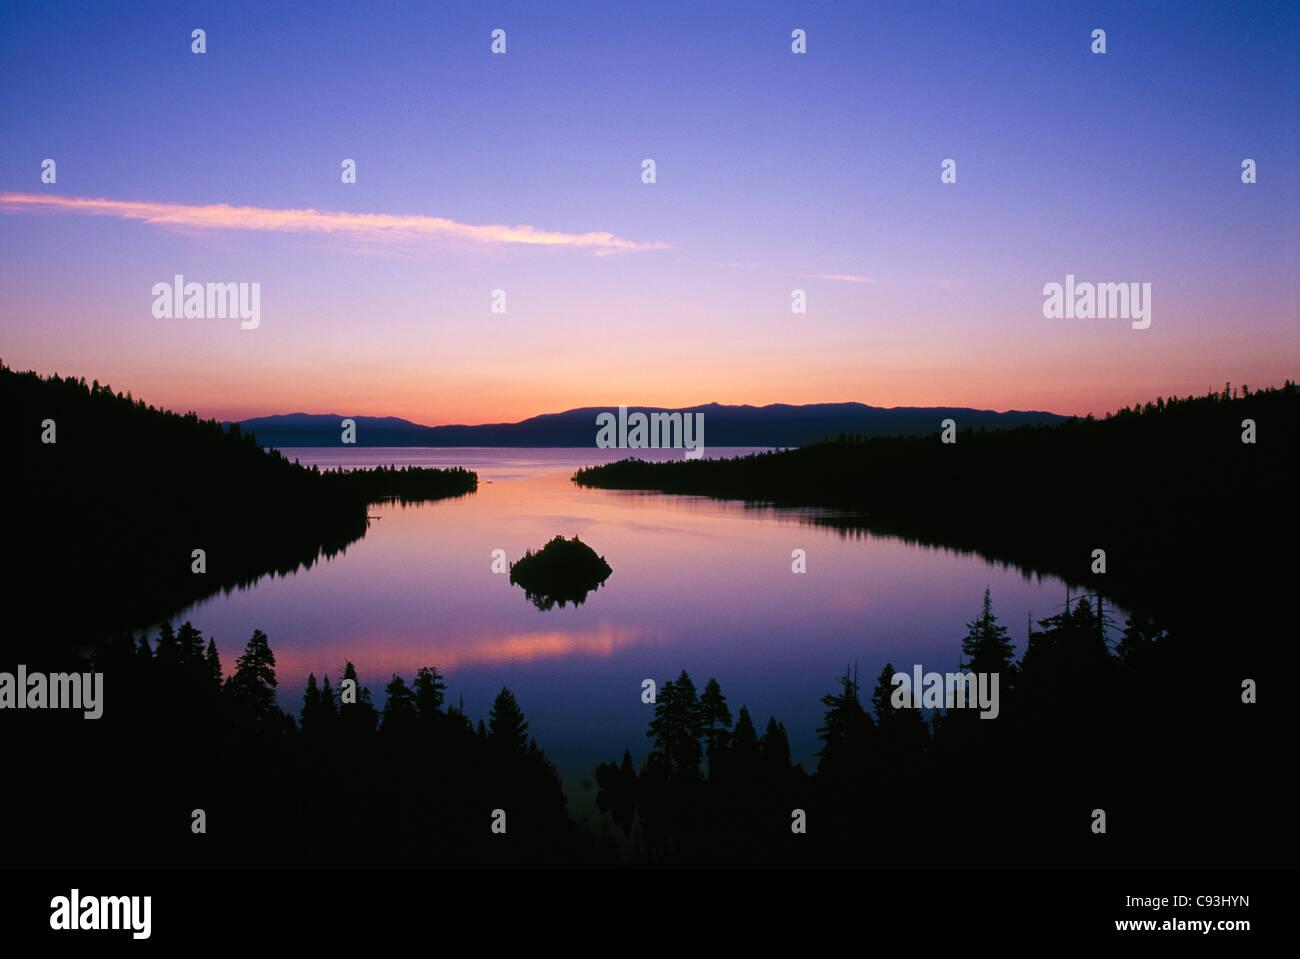 Emerald Bay at dawn; Lake Tahoe, California. Stock Photo